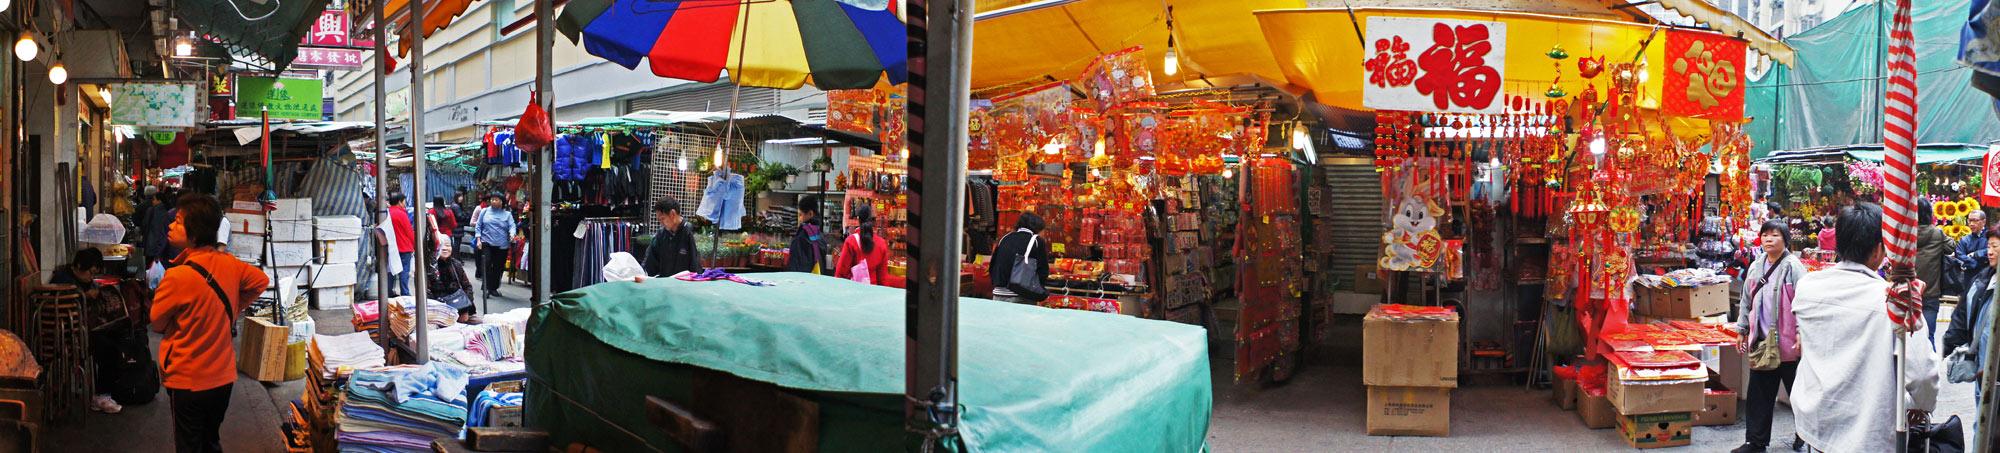 Wanchai-Market1